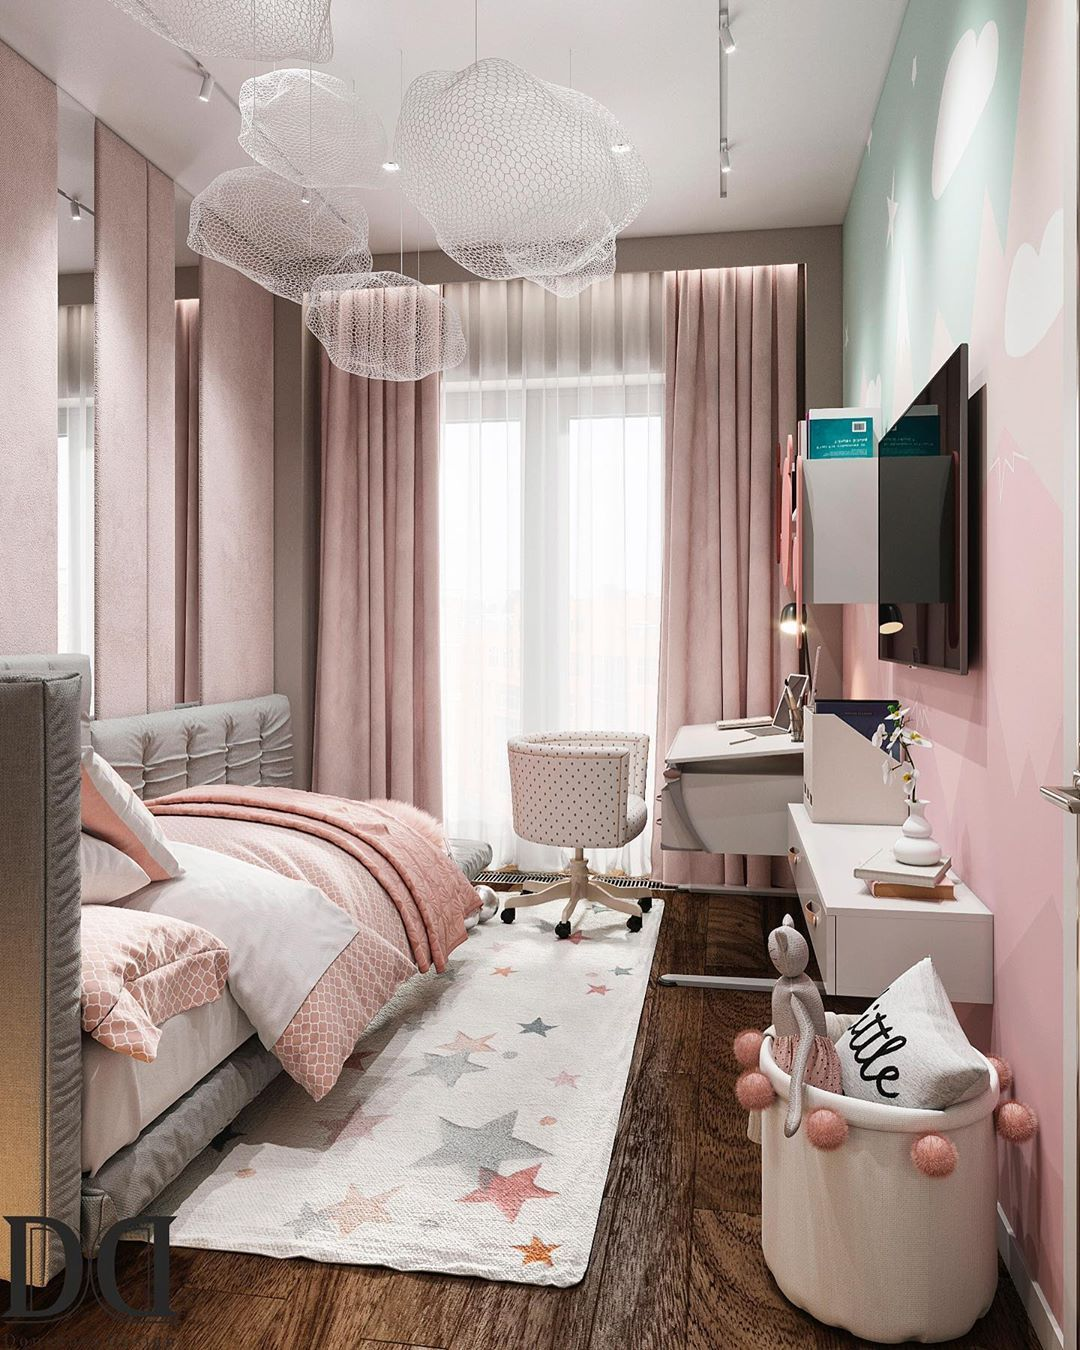 Kids Bedroom With A Mystical Pink Hue Luxury Kids Bedroom Modern Luxury Bedroom Modern Bedroom Interior Pink modern luxury room